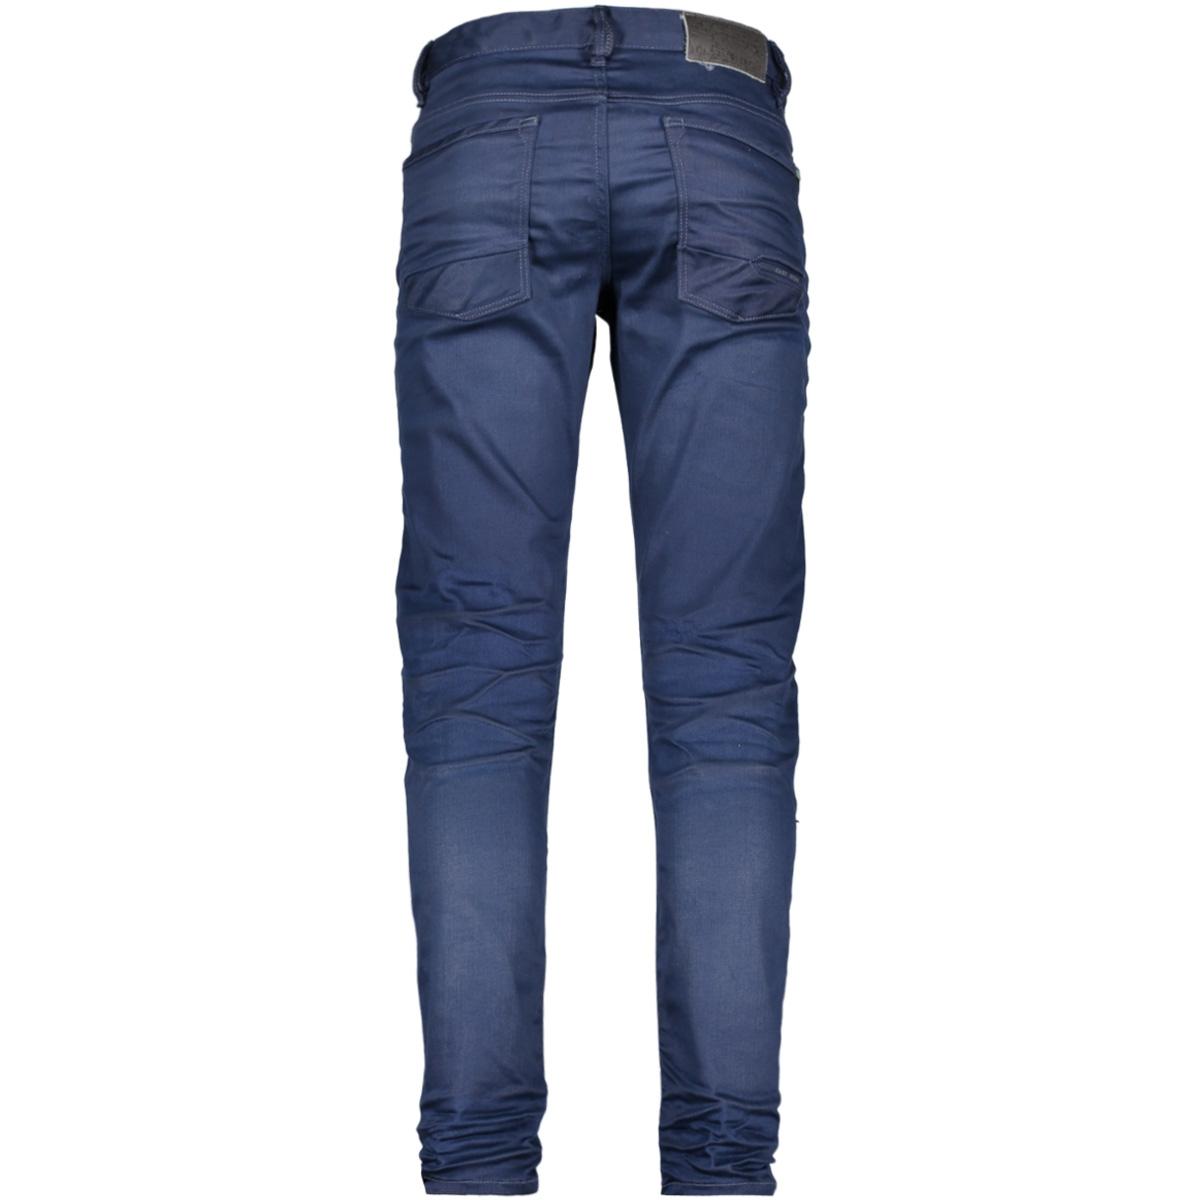 ctr350 cast iron jeans dcb